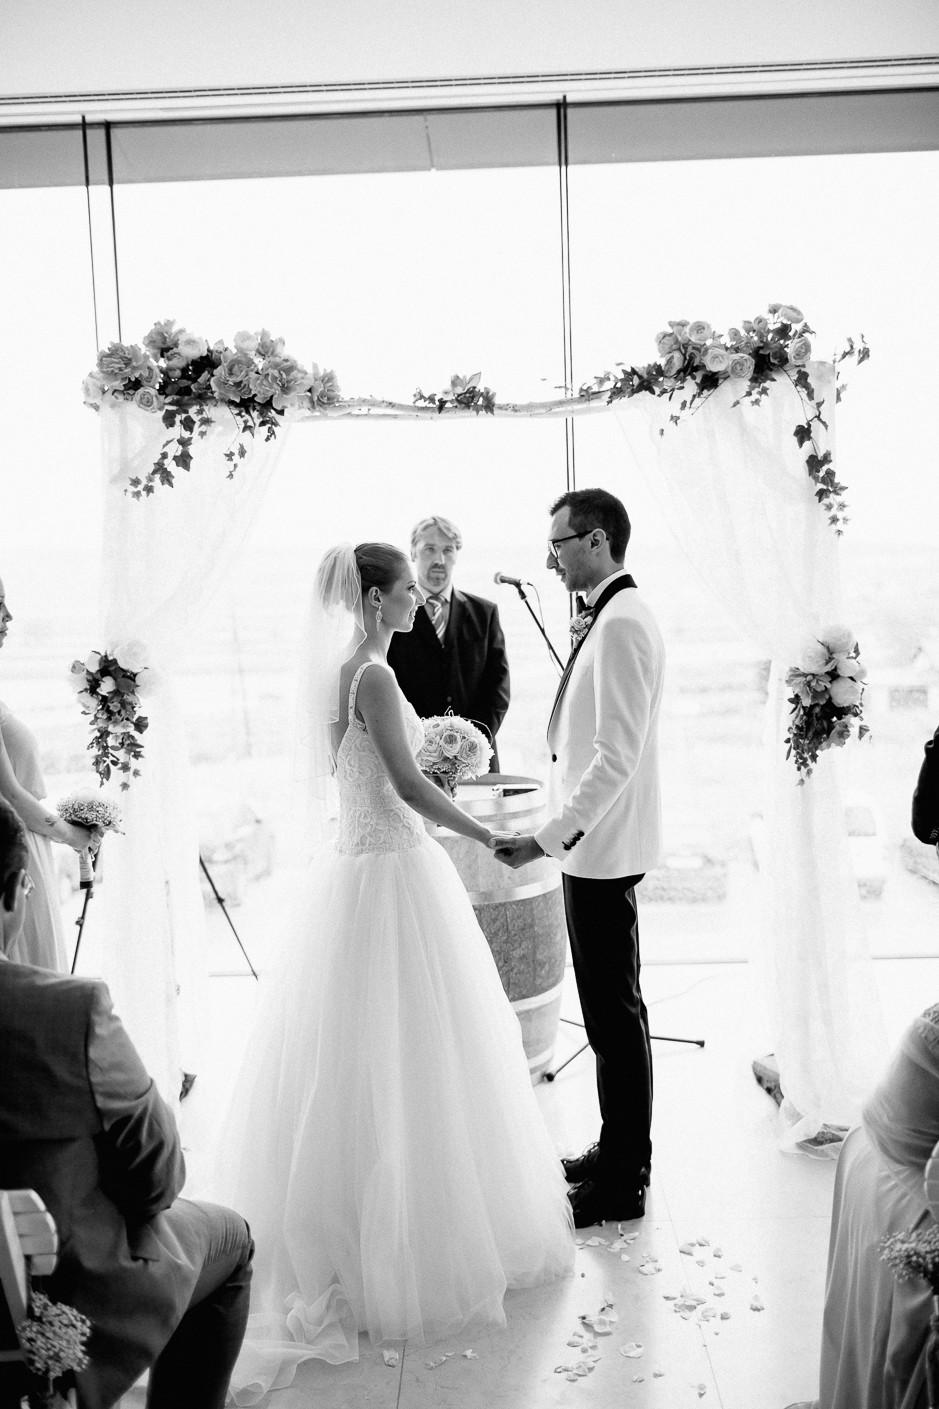 Daniela+Manuel - DM-Hochzeit-Weingut-Hillinger-036.jpg